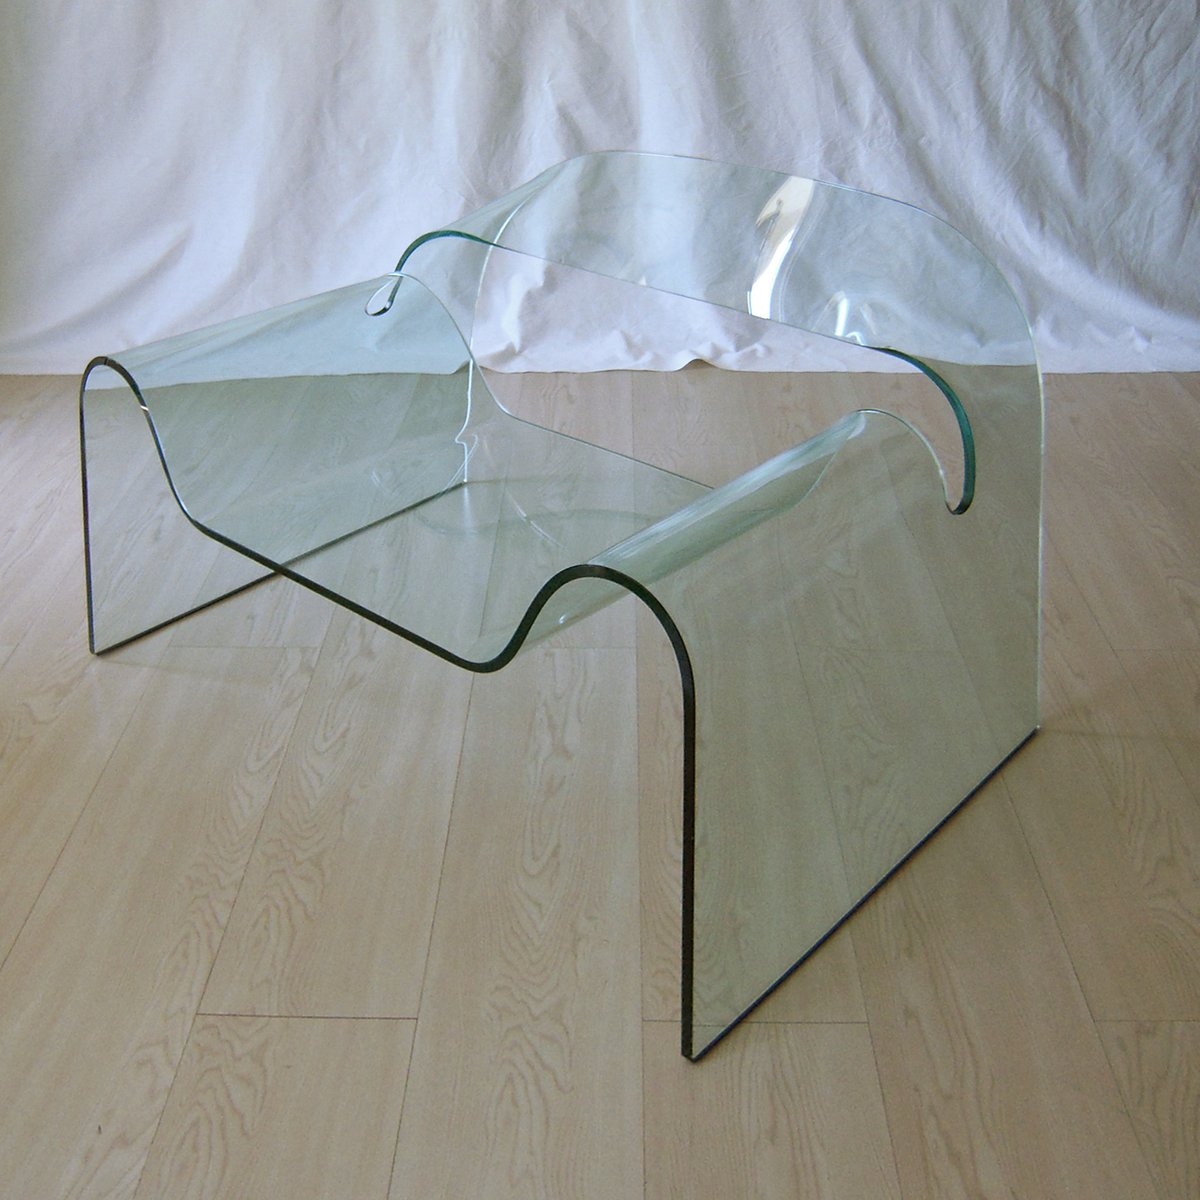 Ghost Glas Sessel von Cini Boeri & Tomu Katayanagi für Fiam, 1987